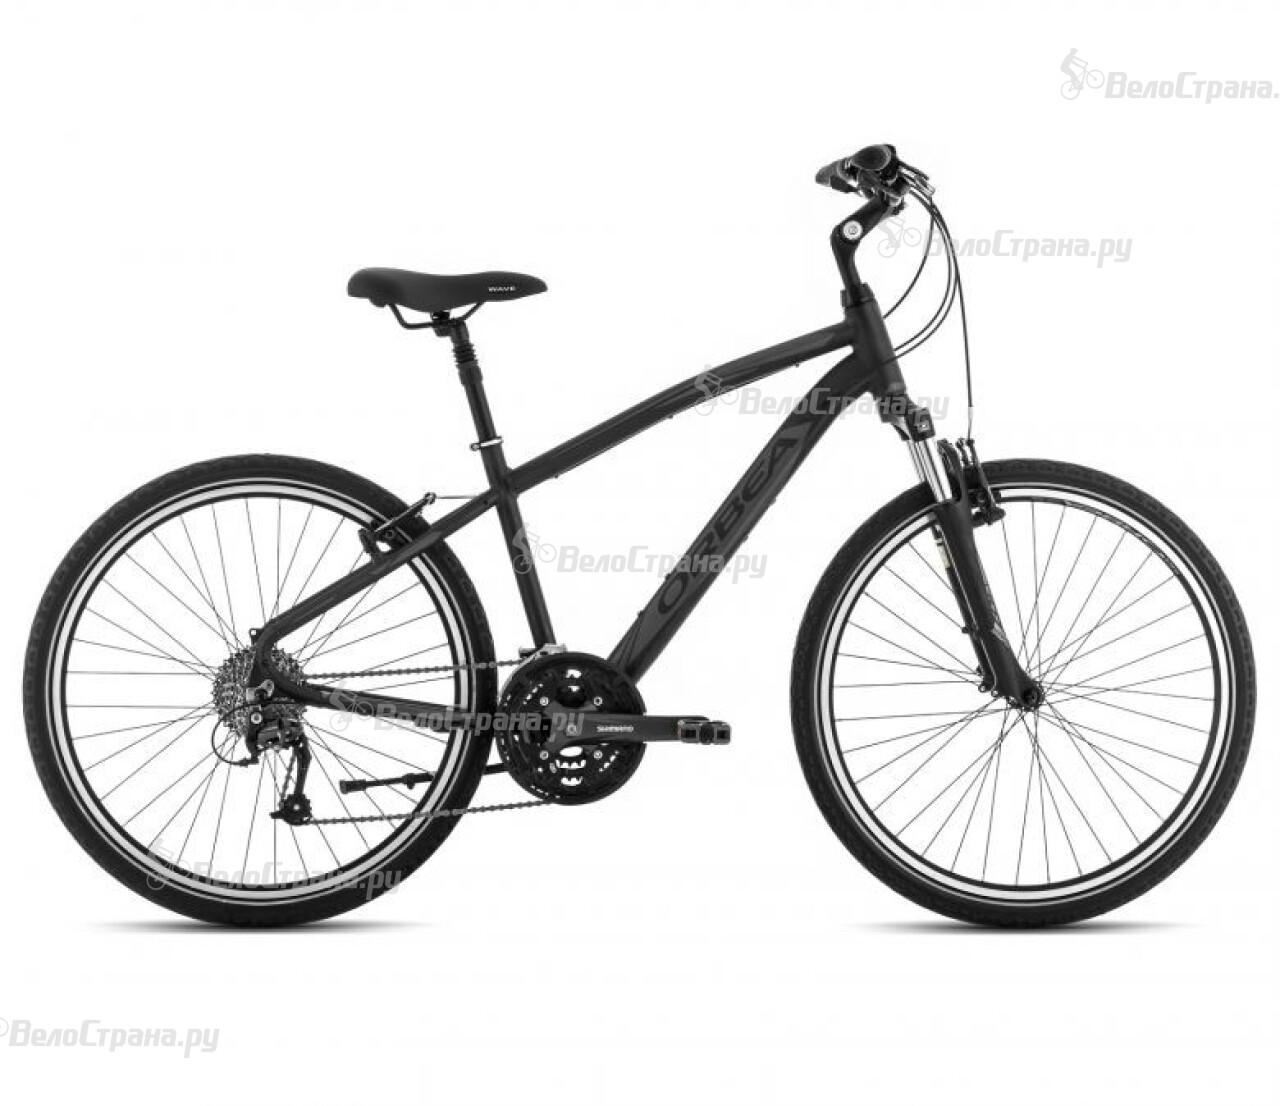 Велосипед Orbea Comfort 26 10 (2014) rear wheel hub for mazda 3 bk 2003 2008 bbm2 26 15xa bbm2 26 15xb bp4k 26 15xa bp4k 26 15xb bp4k 26 15xc bp4k 26 15xd